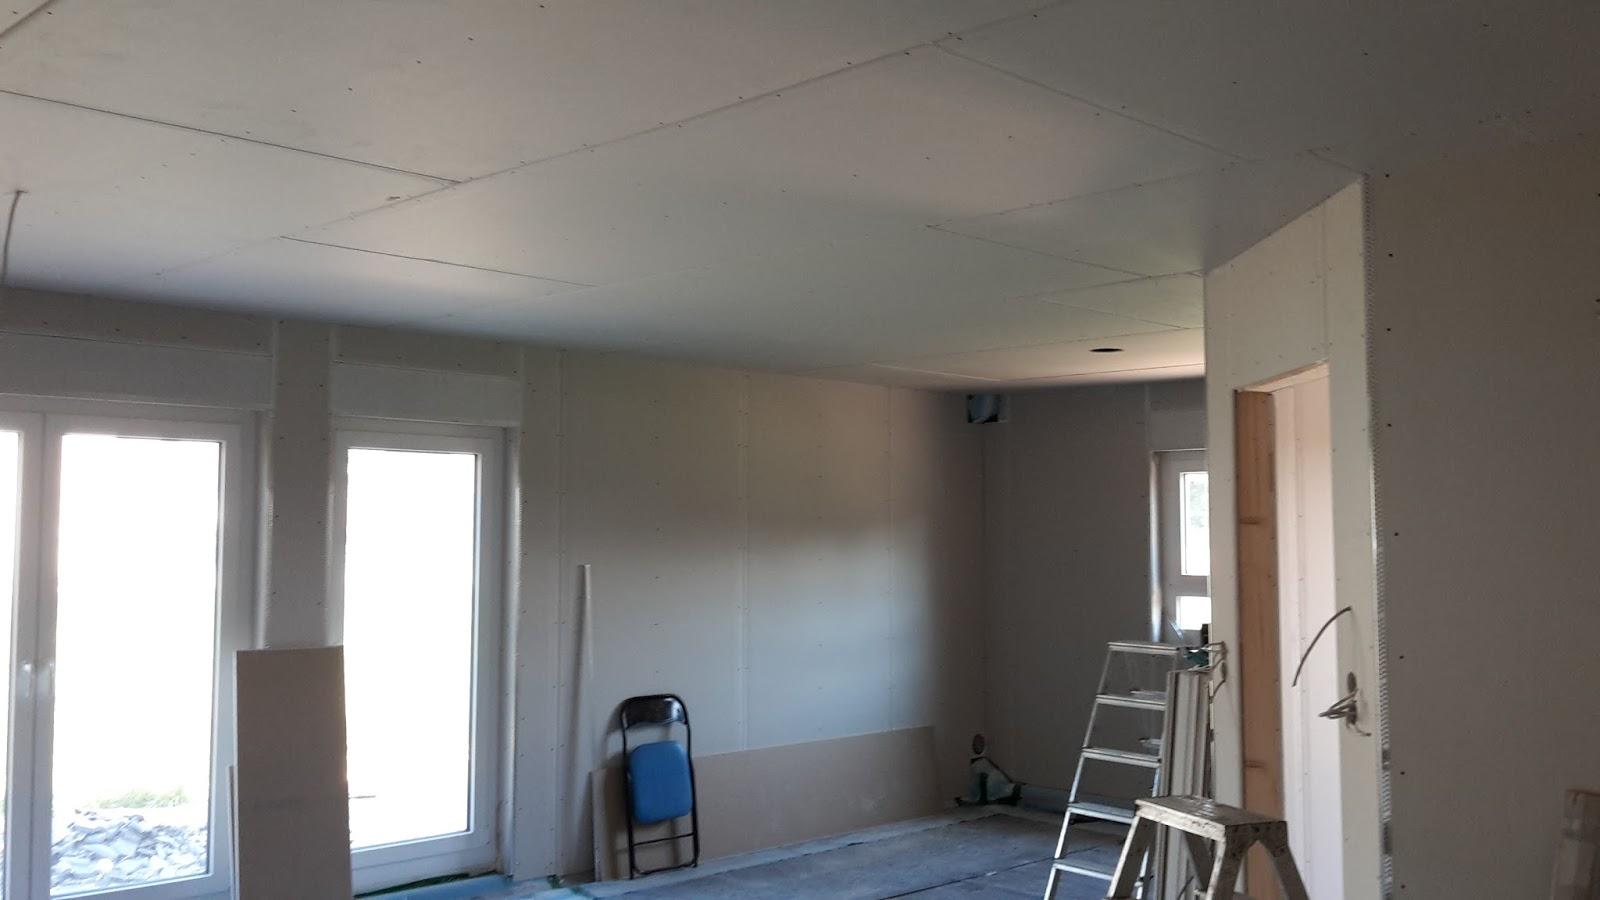 abenteuer ausbauhaus trockenbau beendet. Black Bedroom Furniture Sets. Home Design Ideas